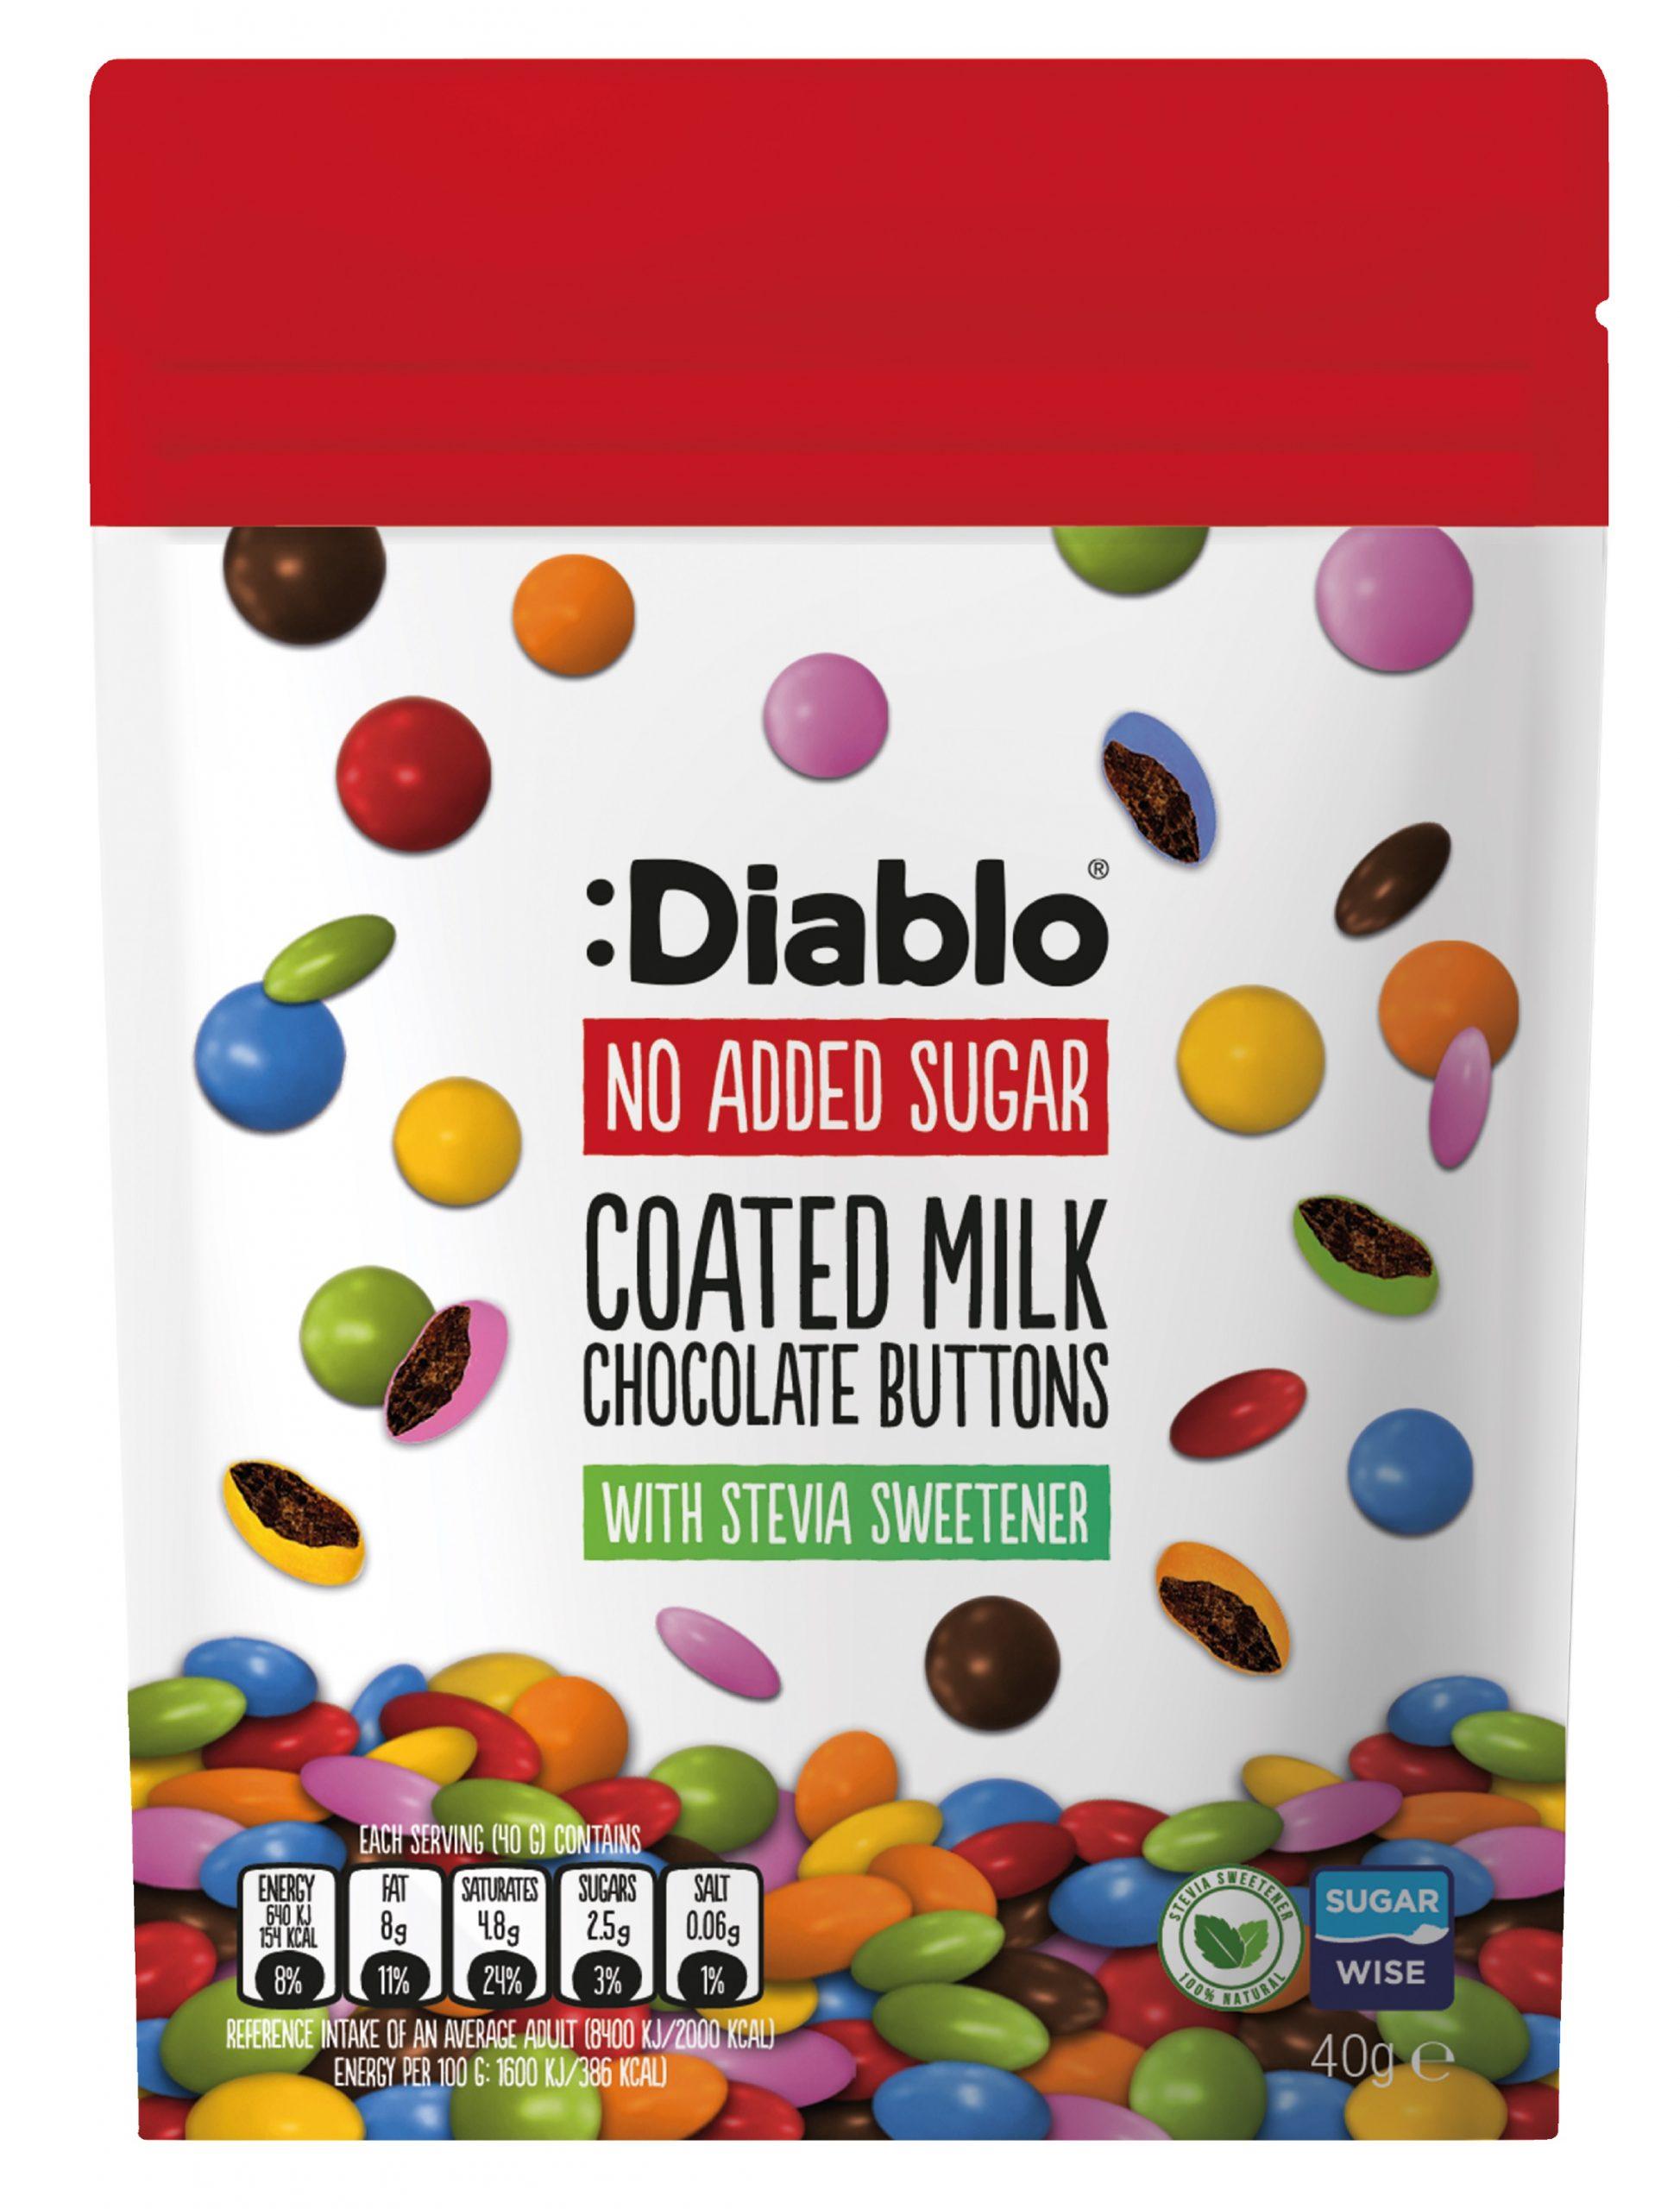 Diablo NAS Coated Milk Chocolate Buttons